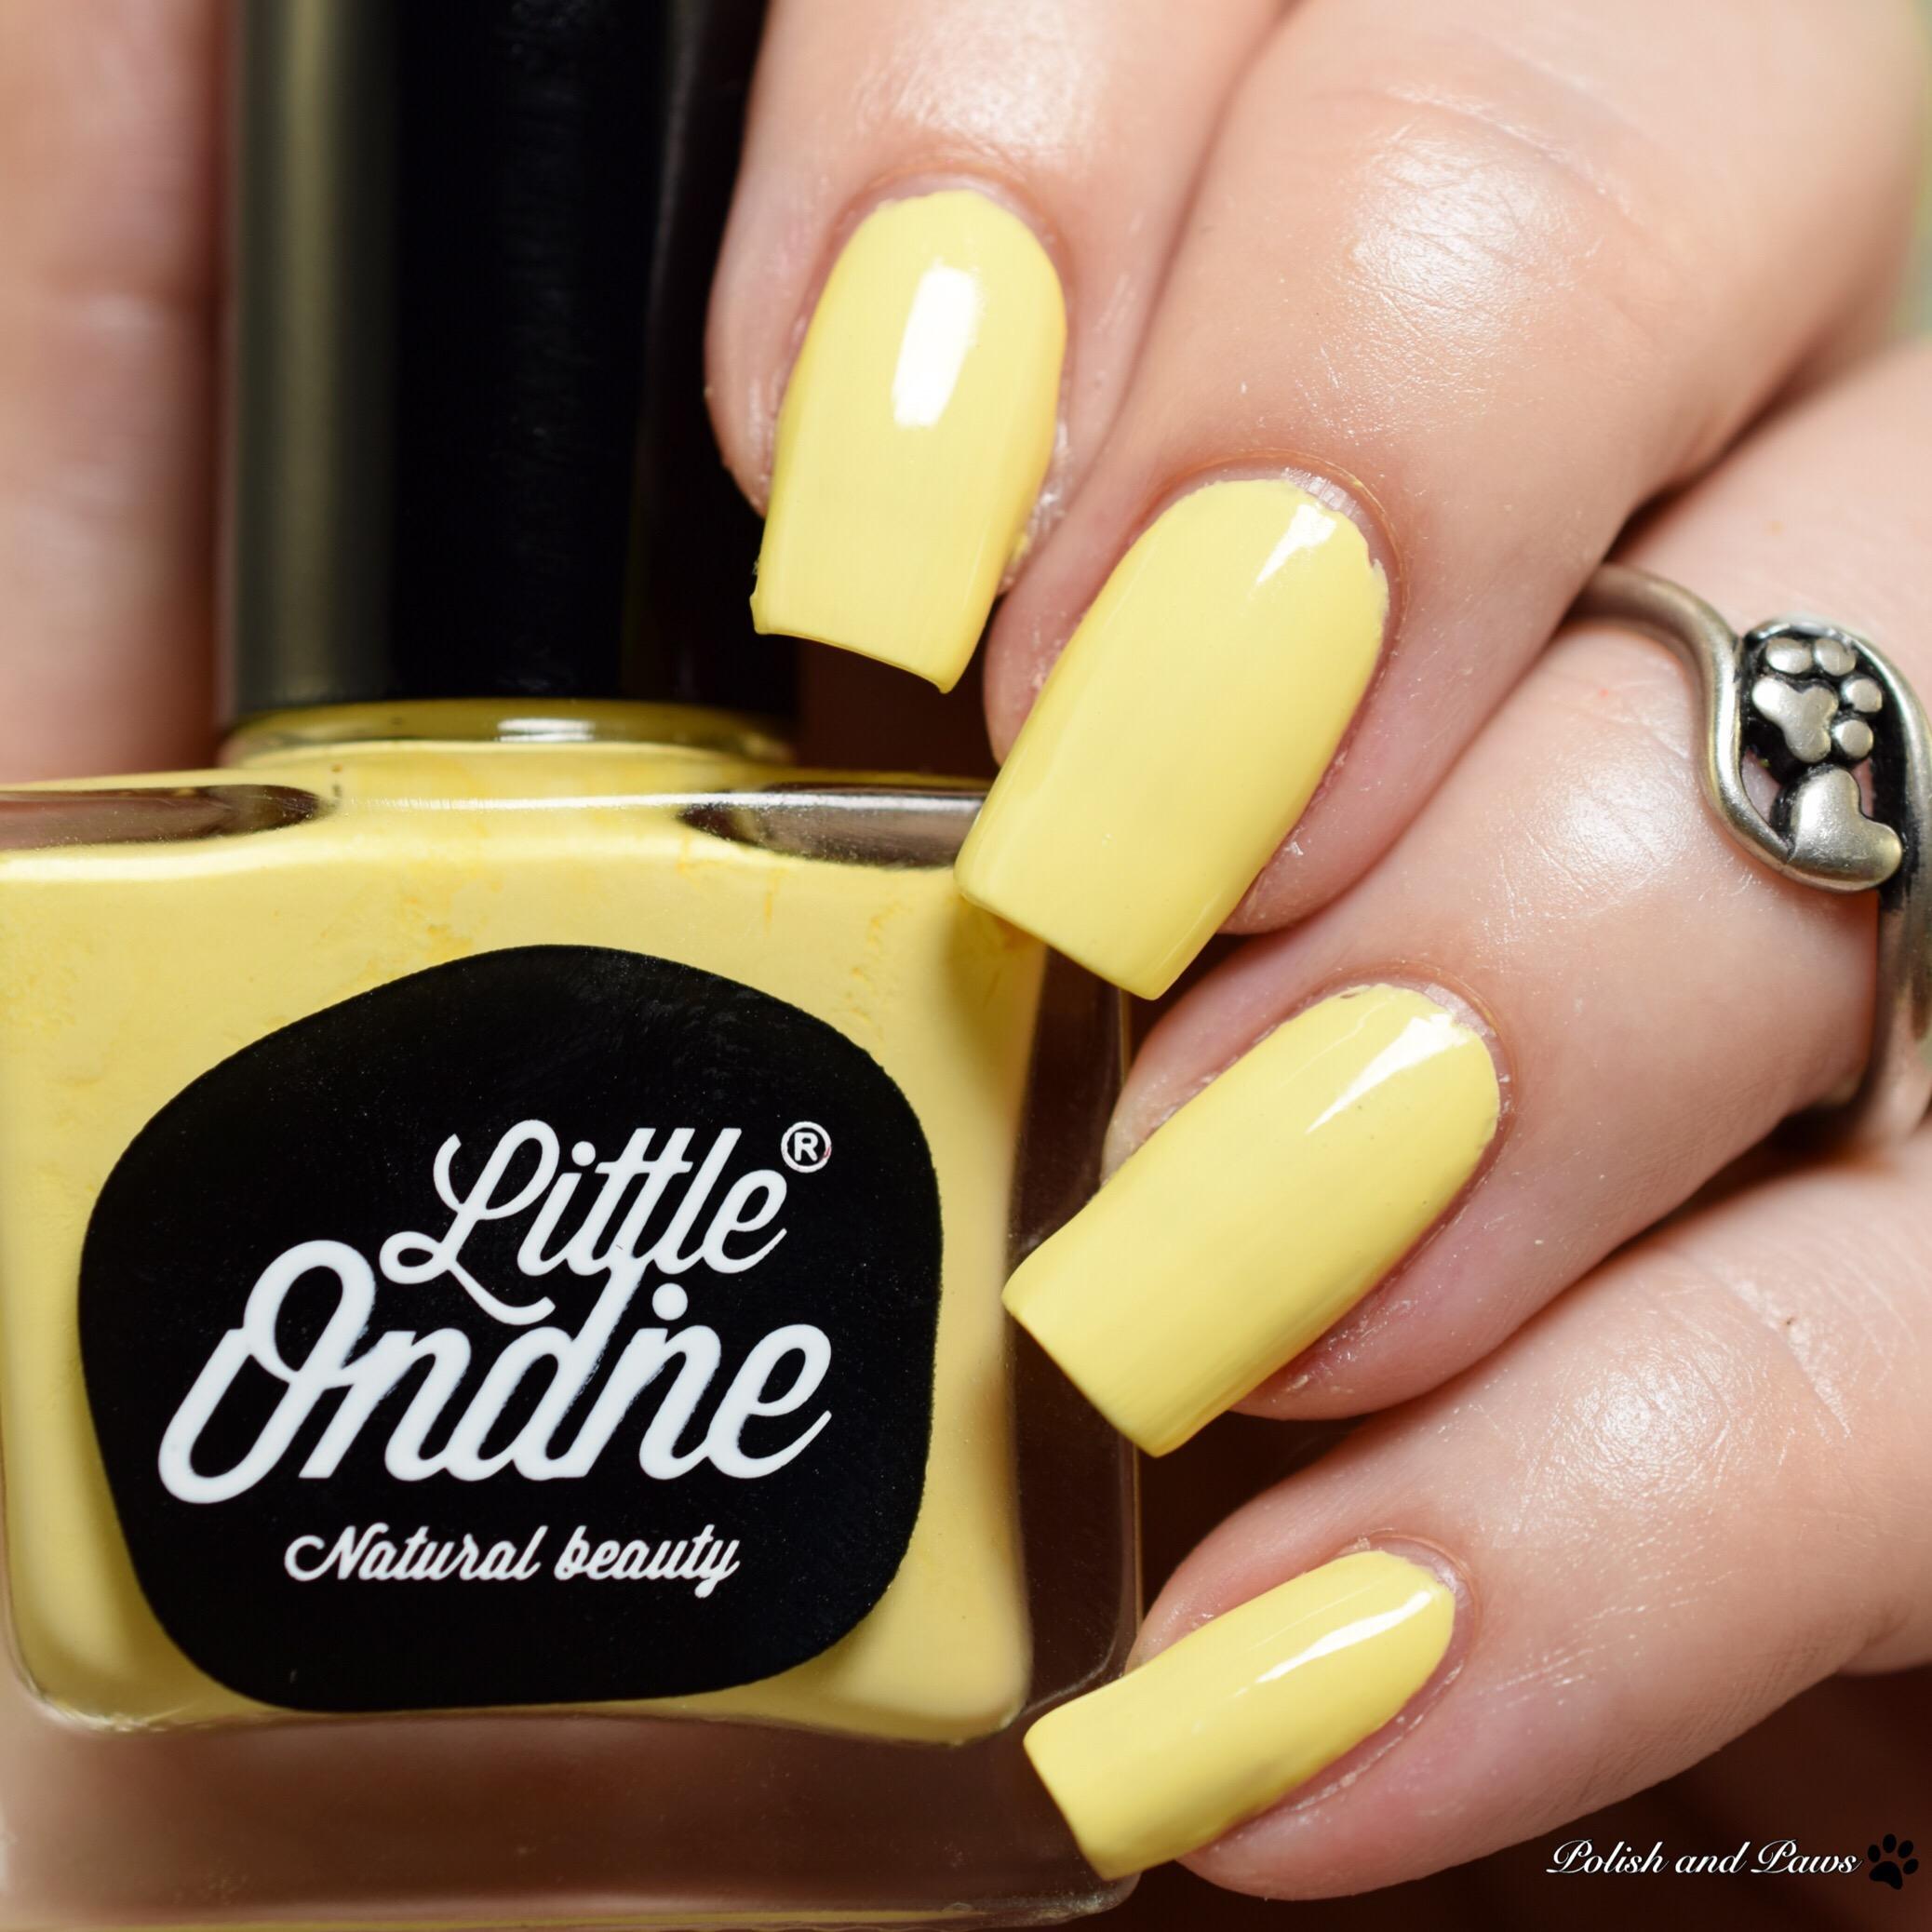 Little Ondine Citrus